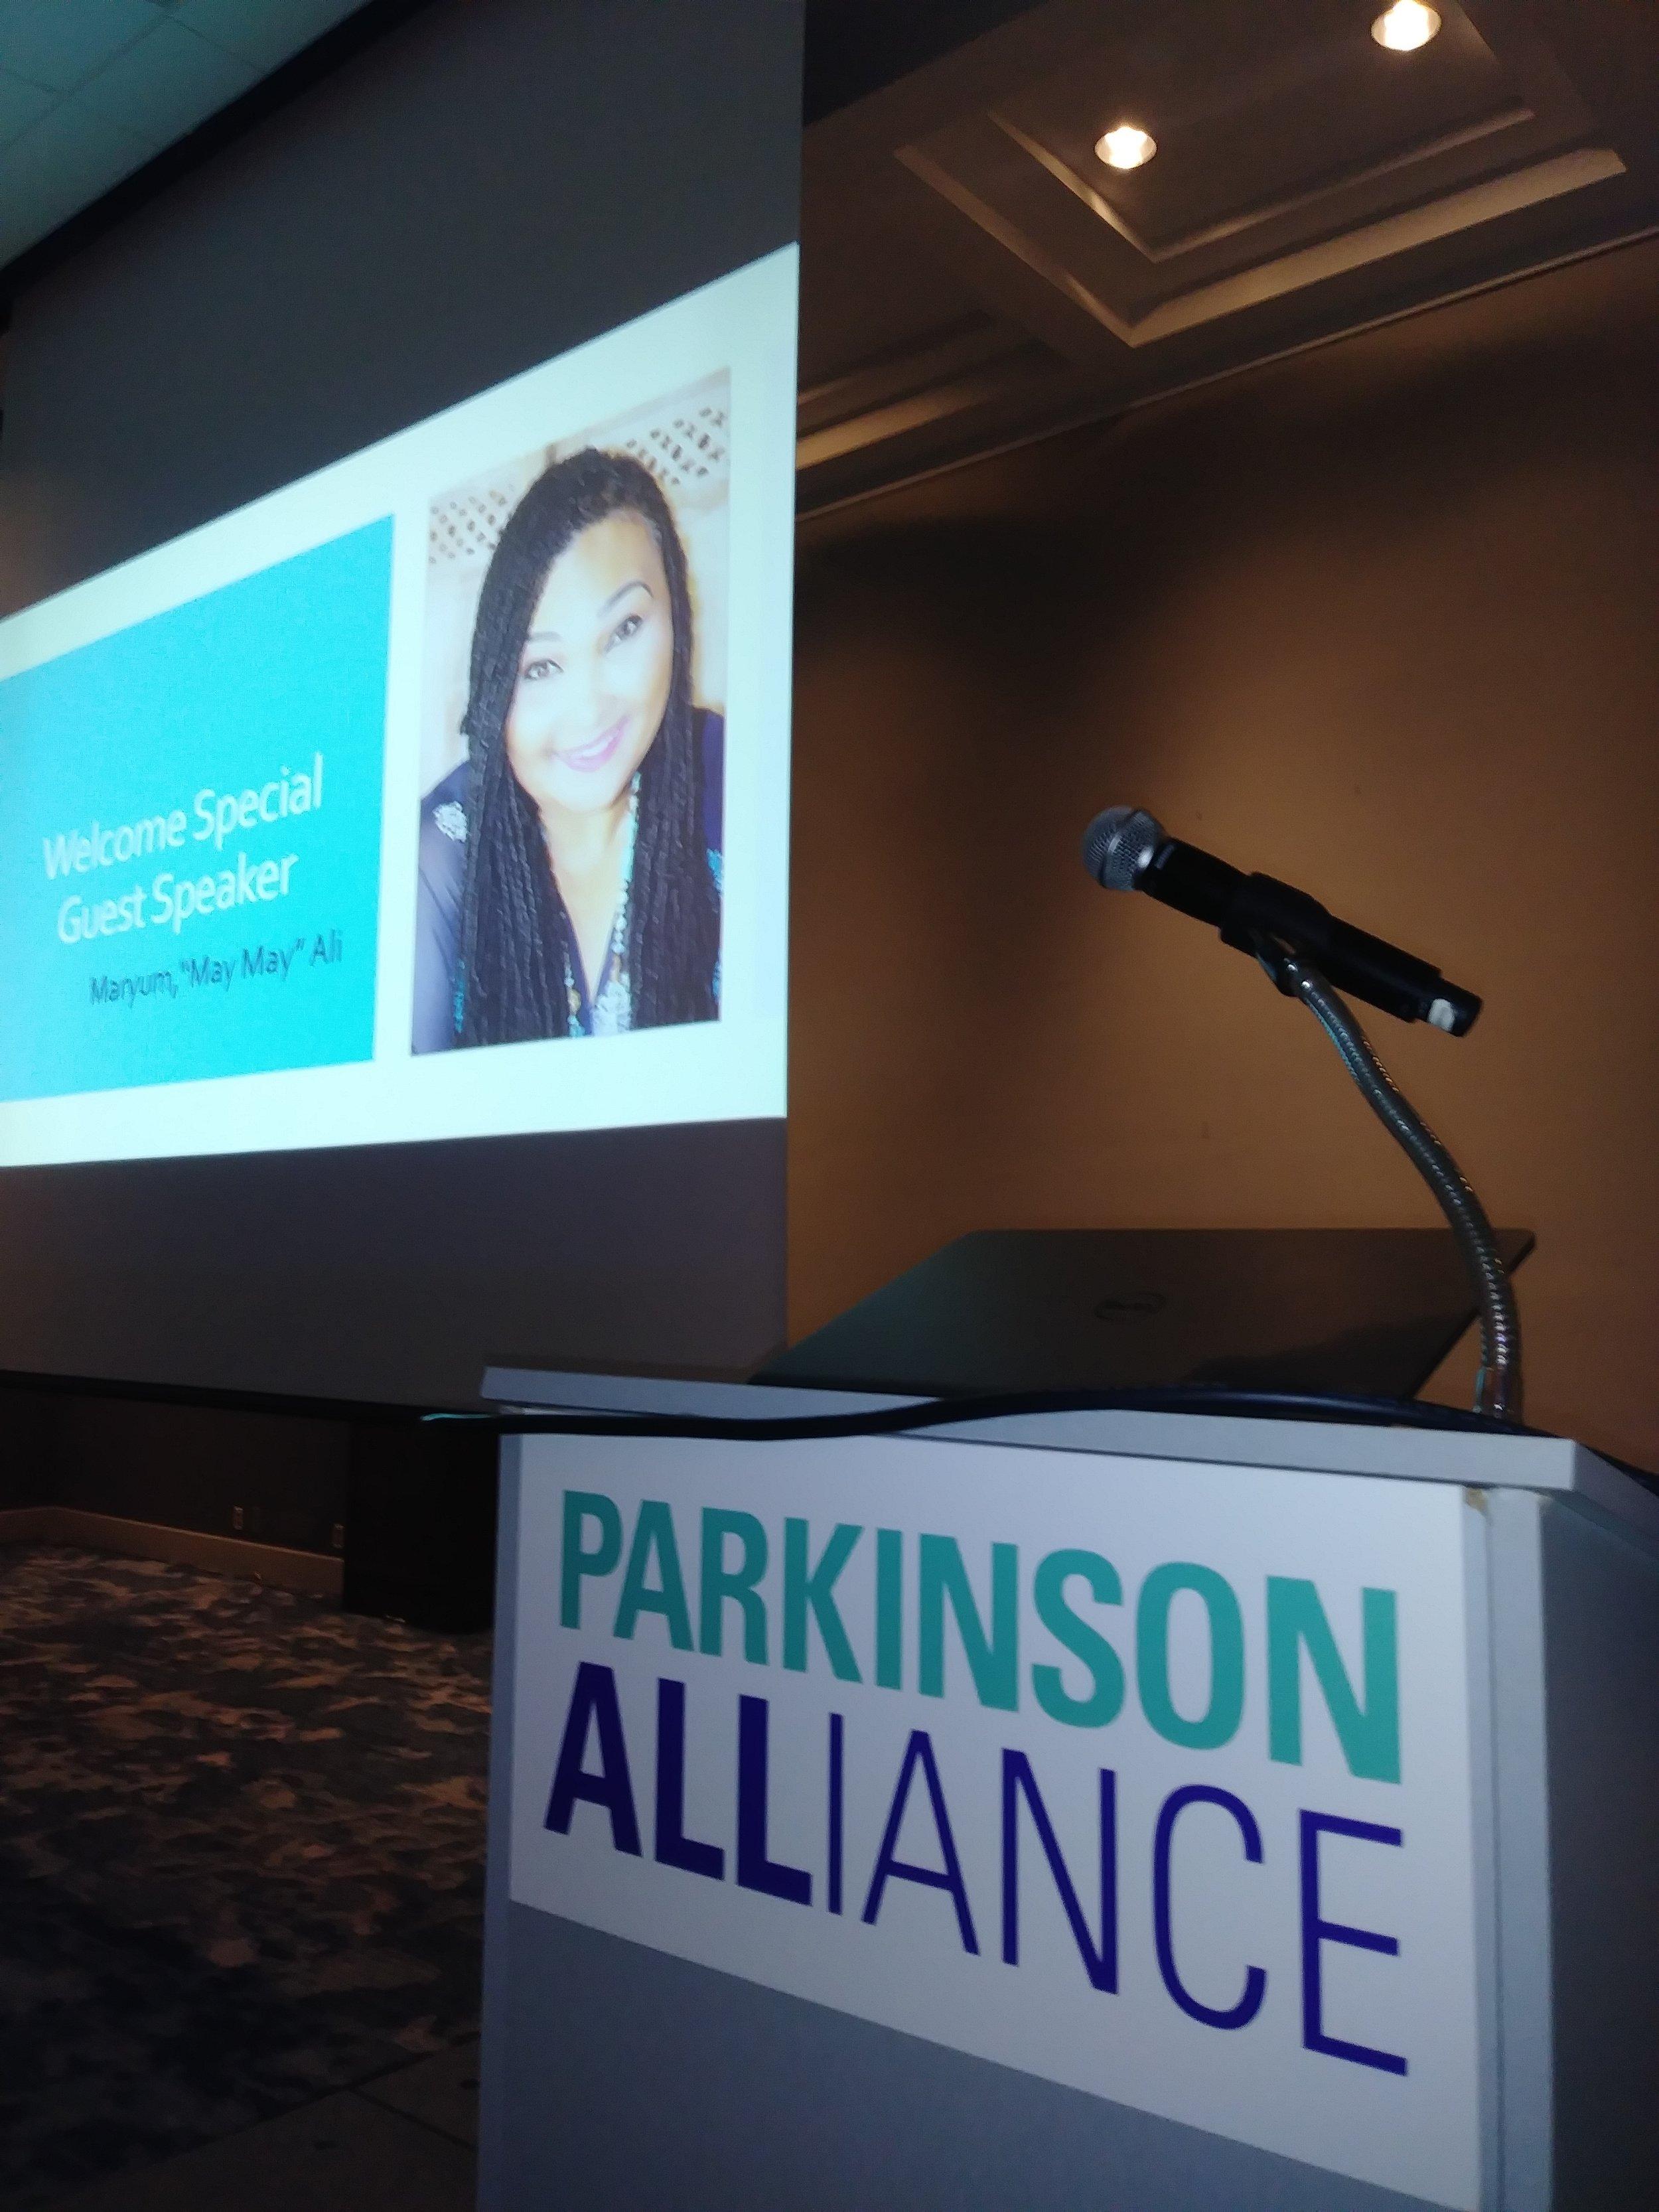 Parkinson Alliance Podium without me.jpg